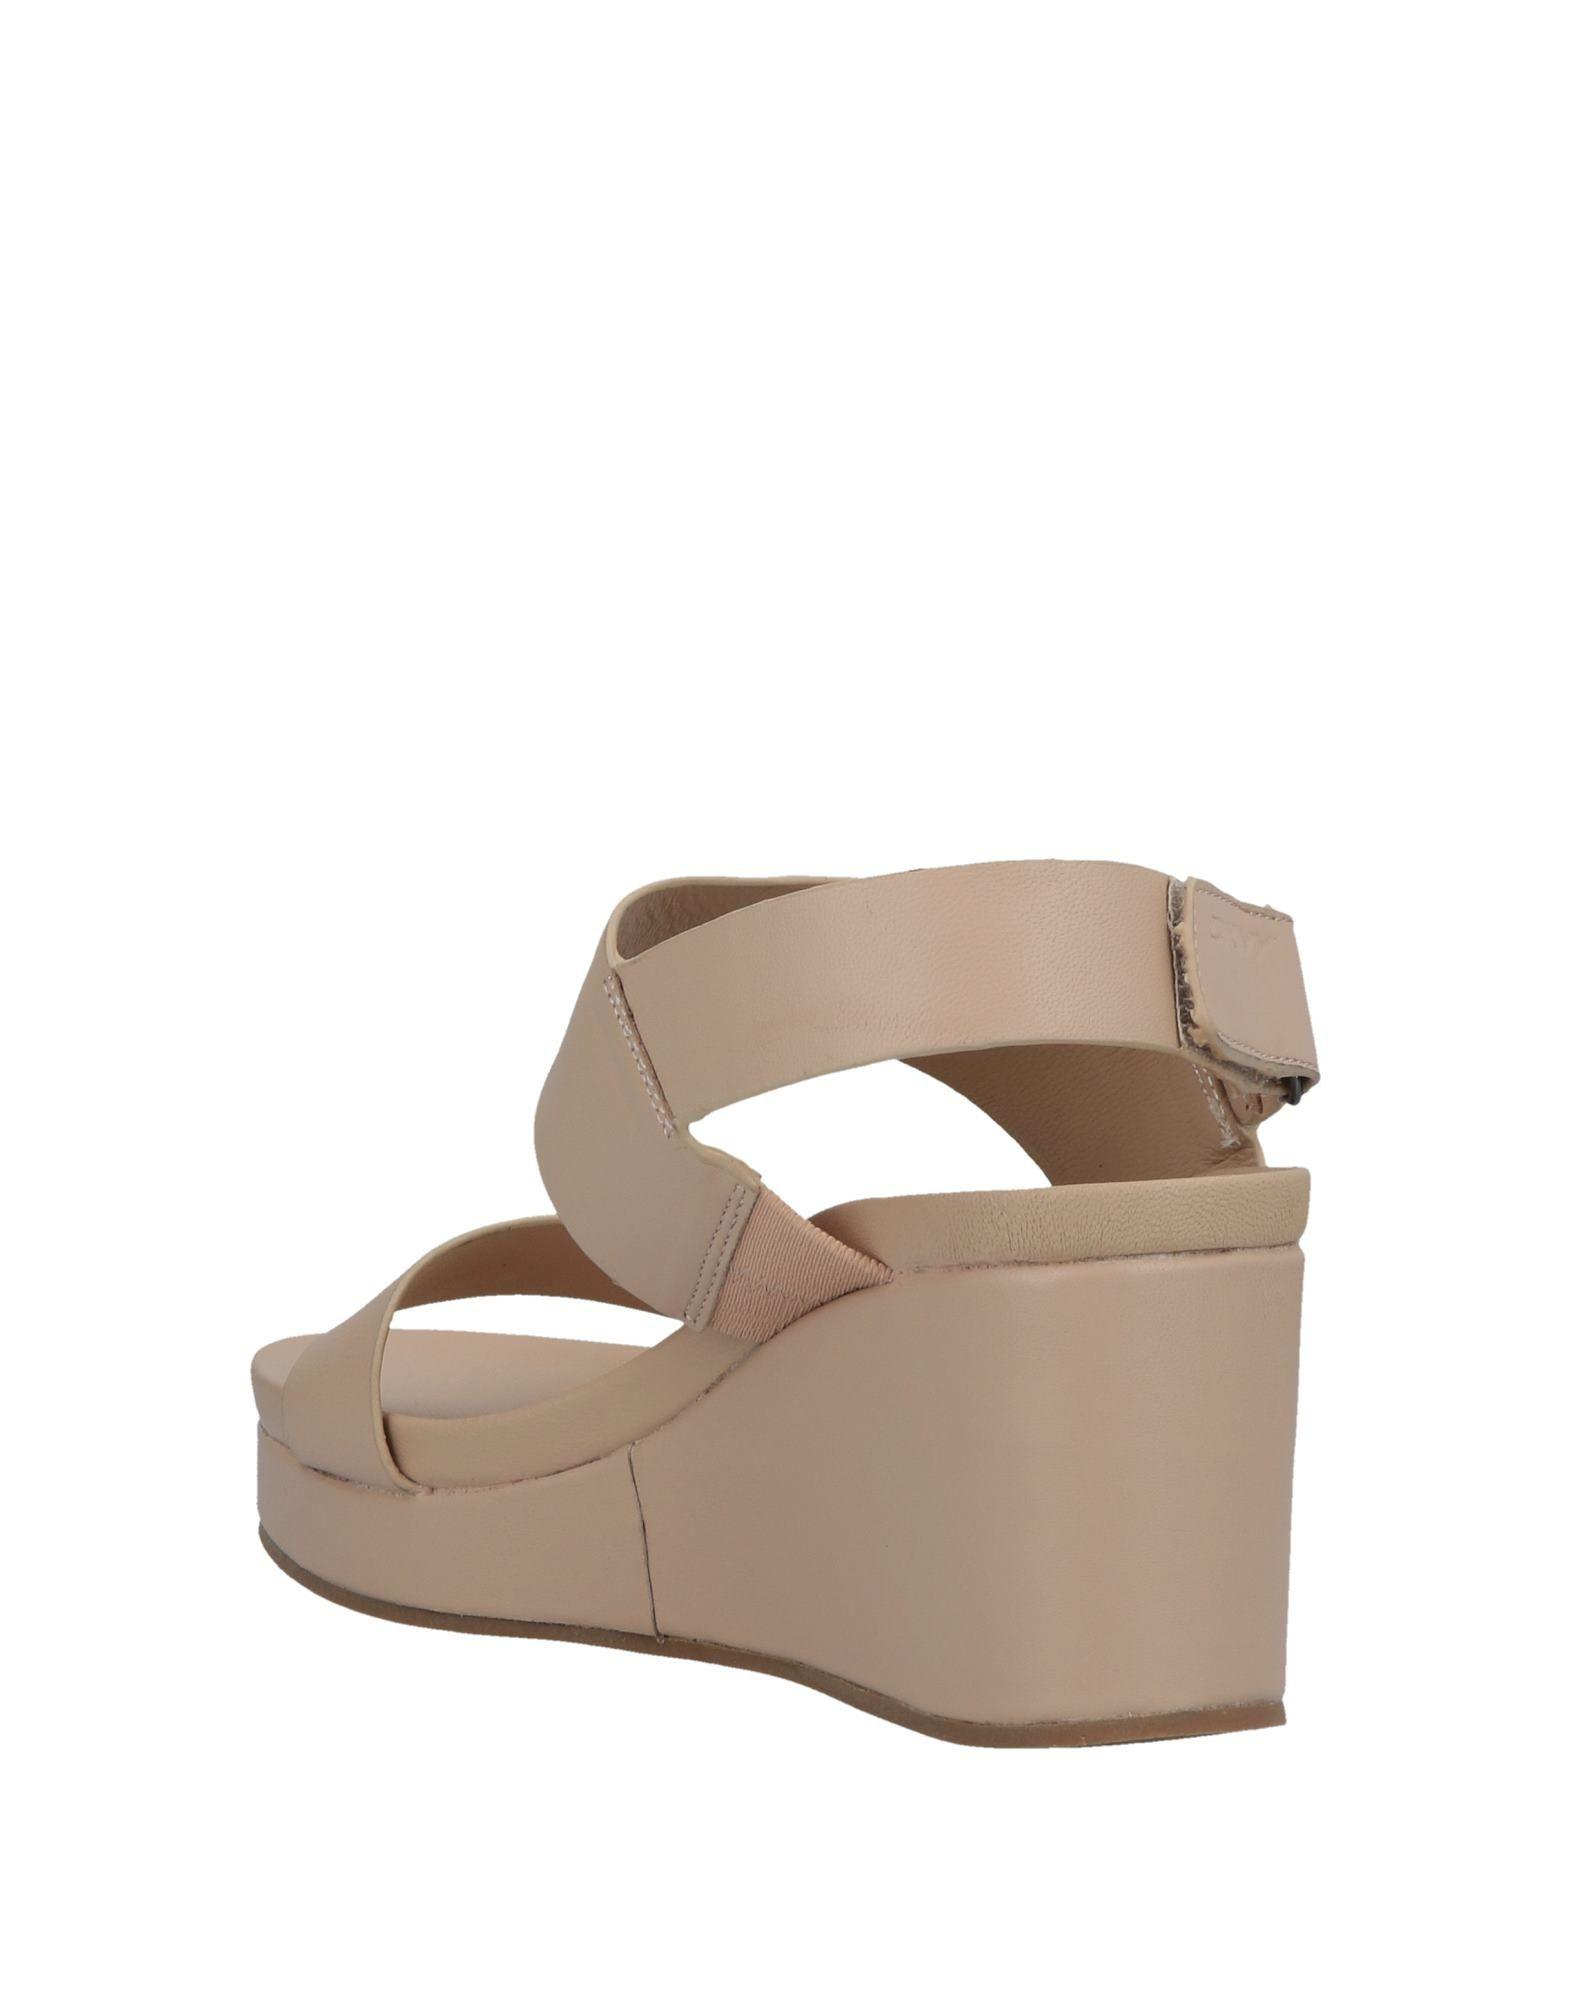 36e90f6834d1 Lyst - Dkny Sandals